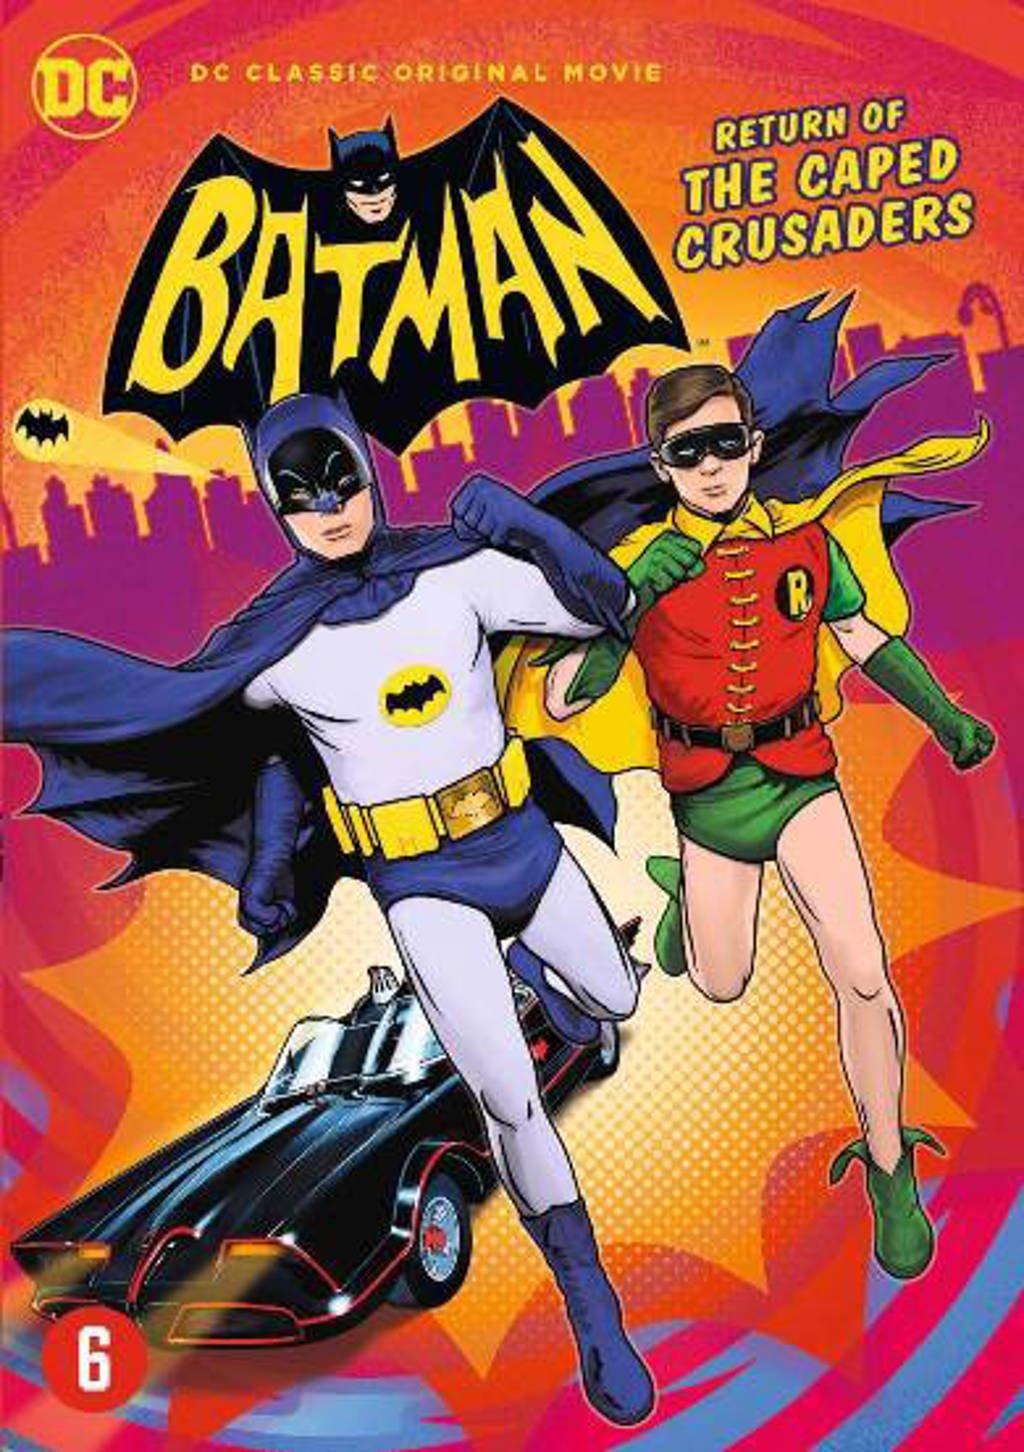 Batman - Return of the caped crusaders (DVD)